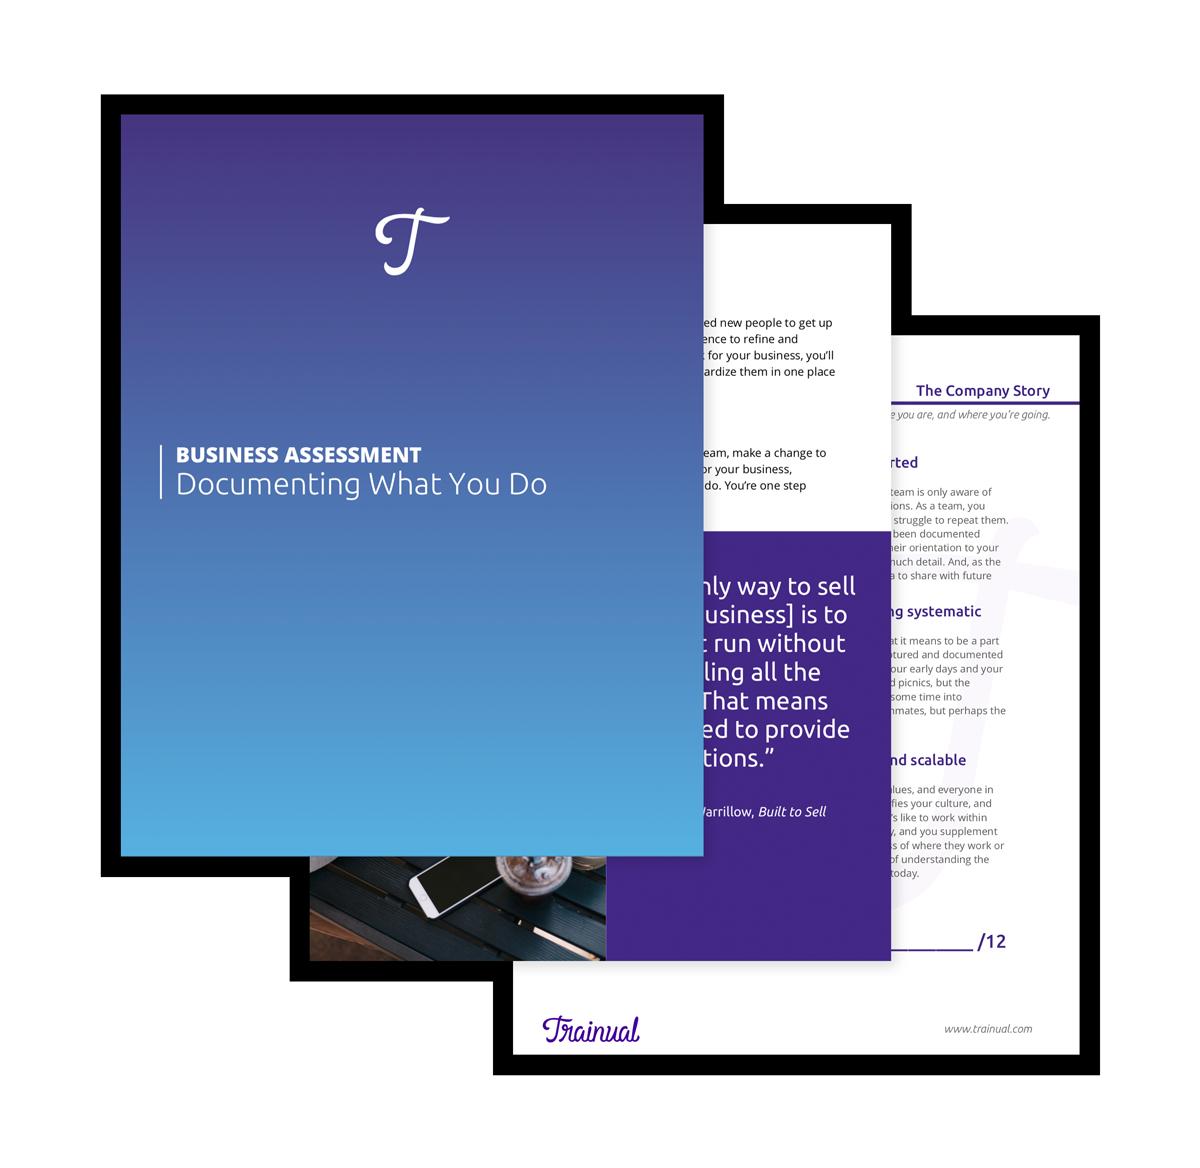 business-documentation-assessment-image